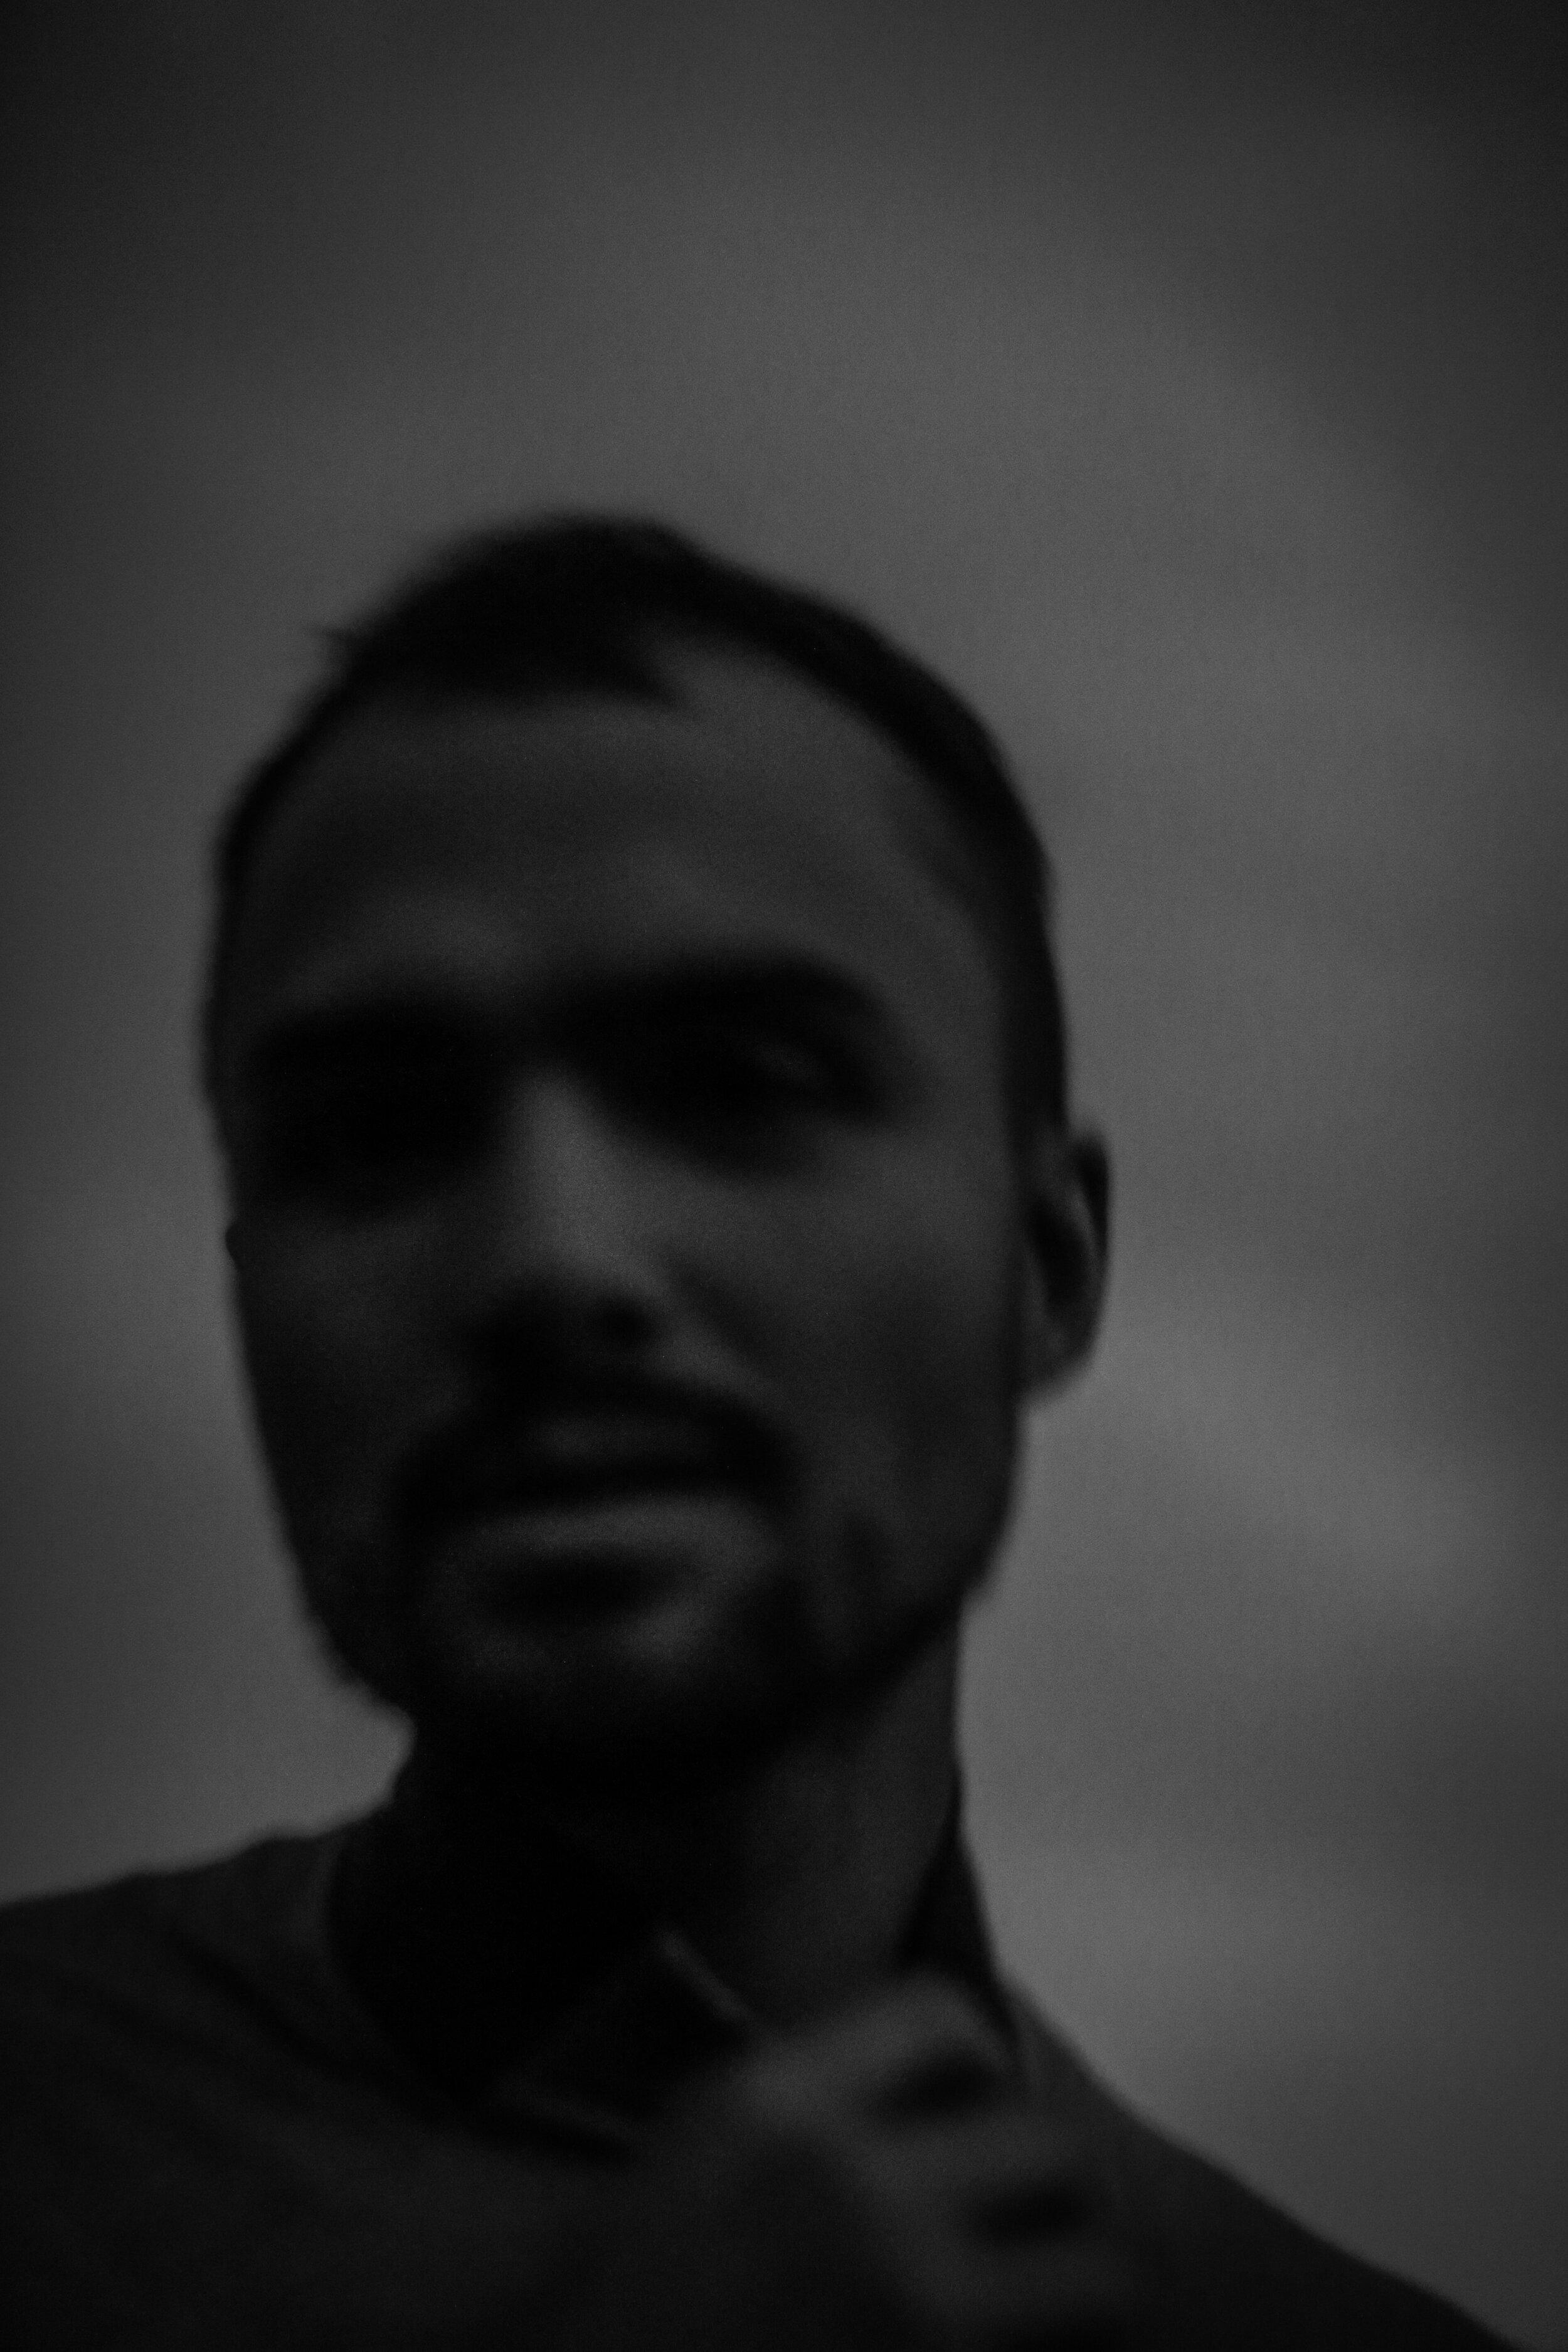 rhys-blur-park-ldp-9554-2.jpg